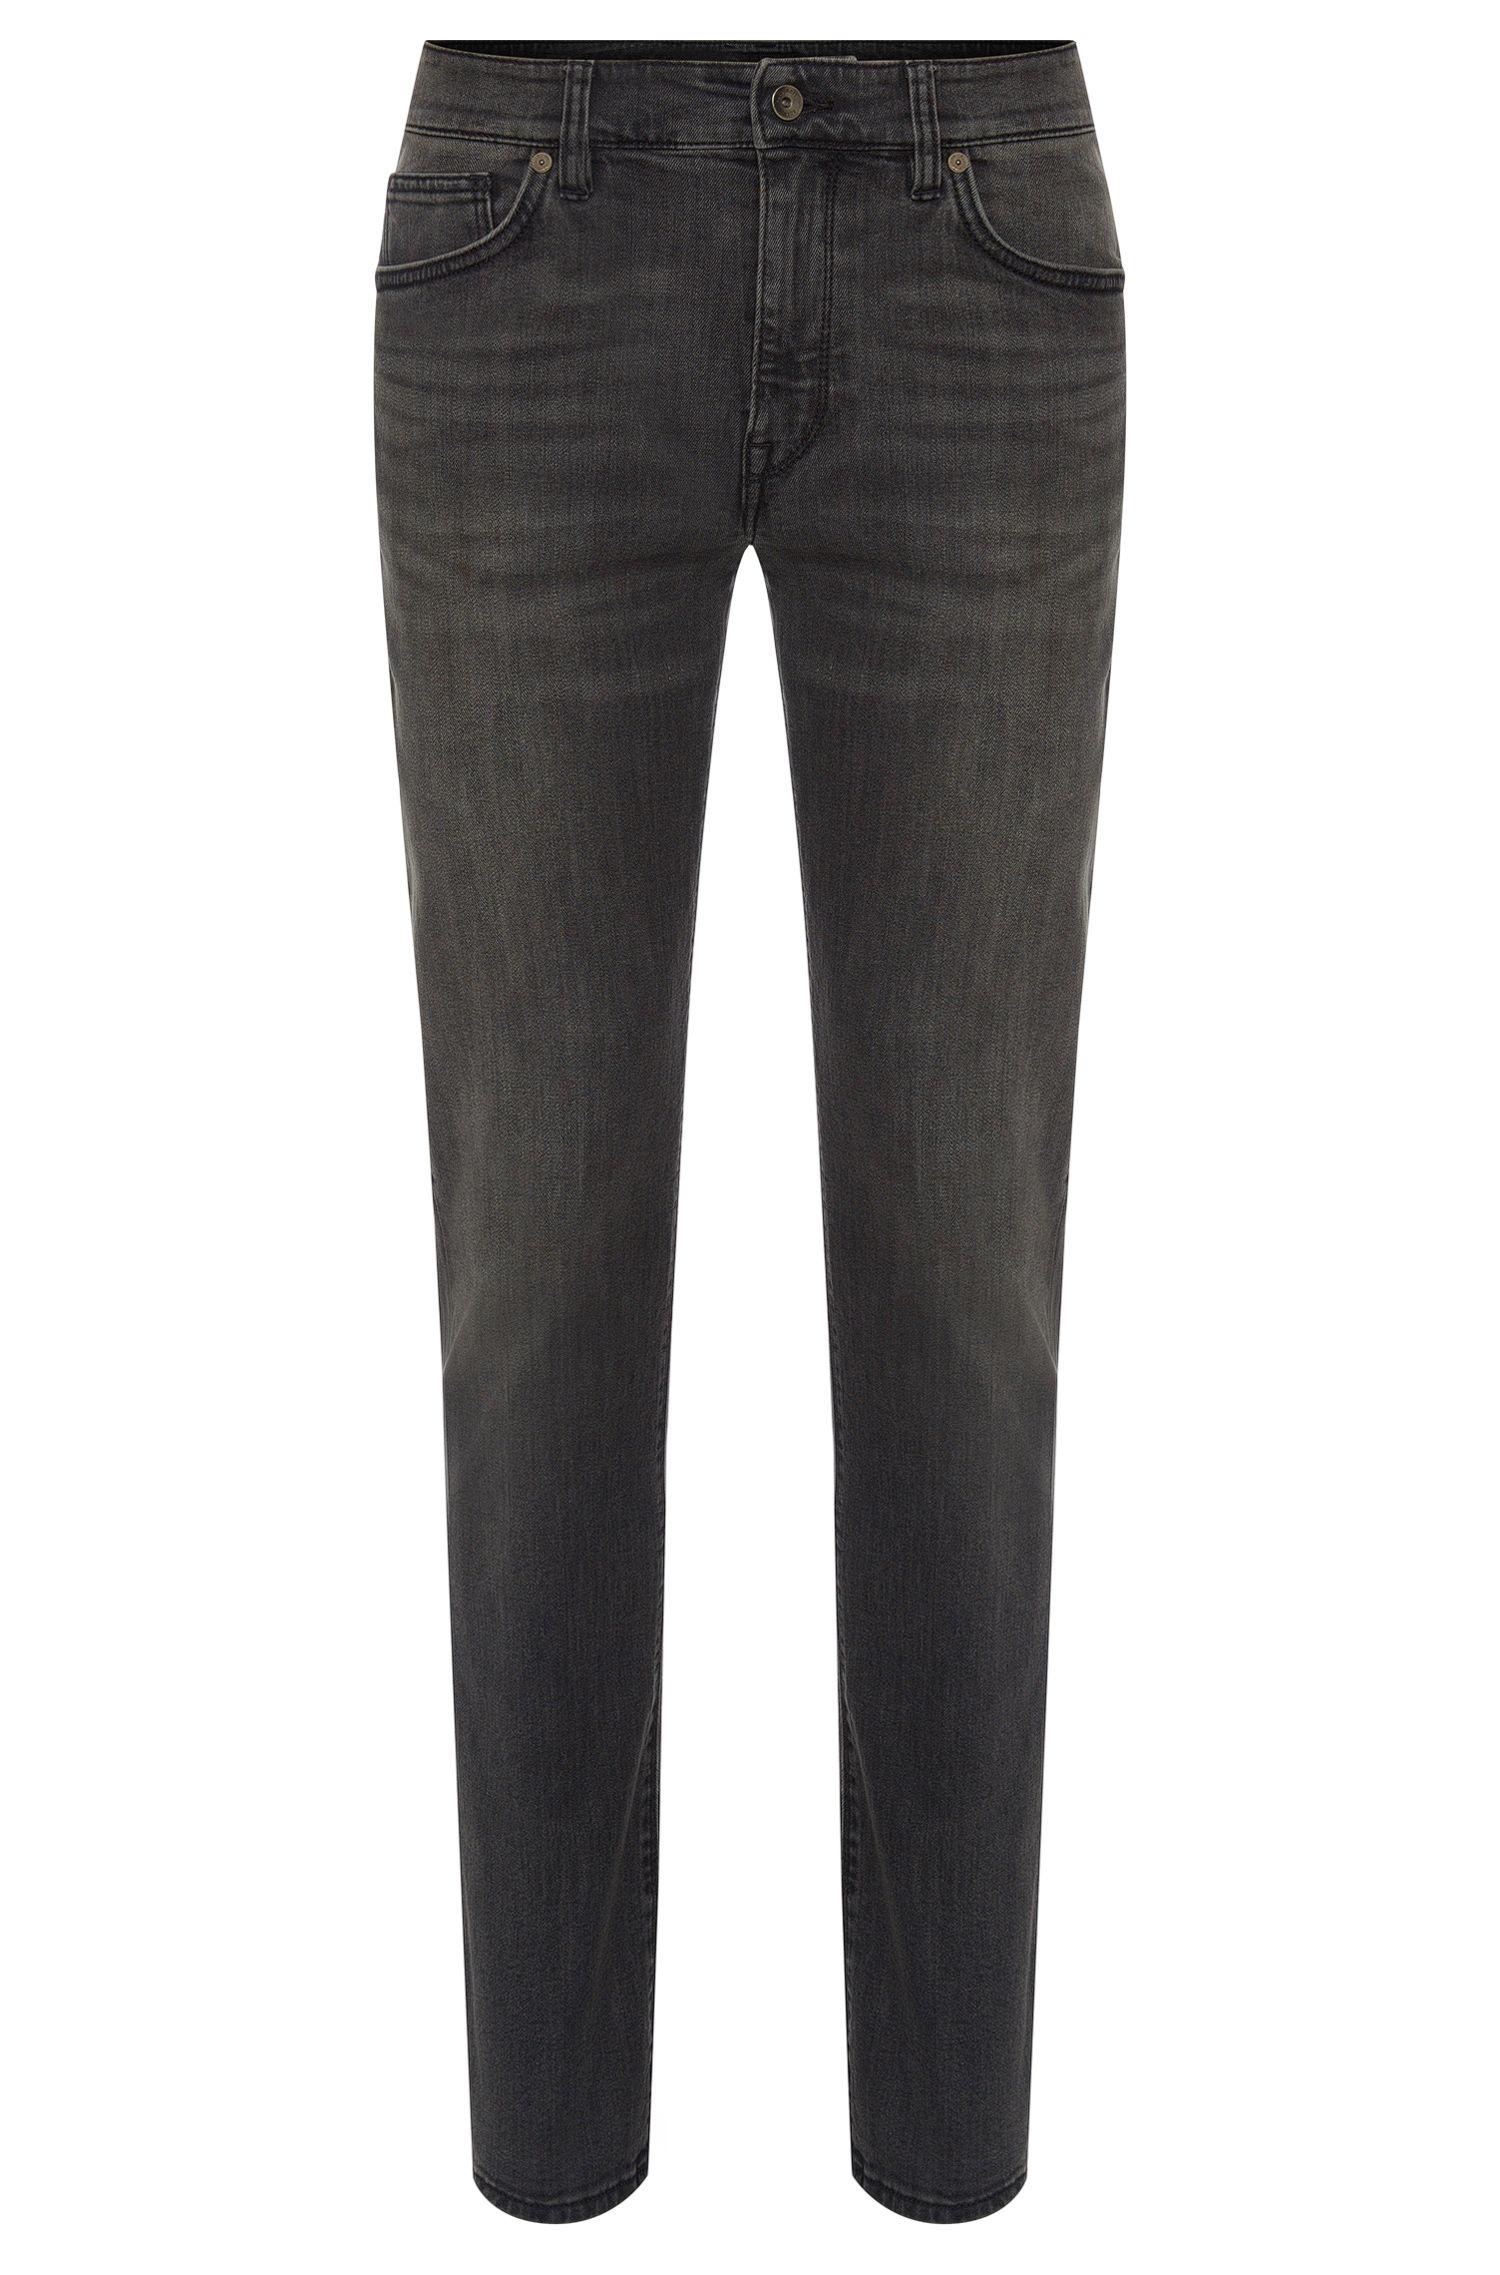 'Maine' | Regular Fit, 8 oz Stretch Cotton Jeans